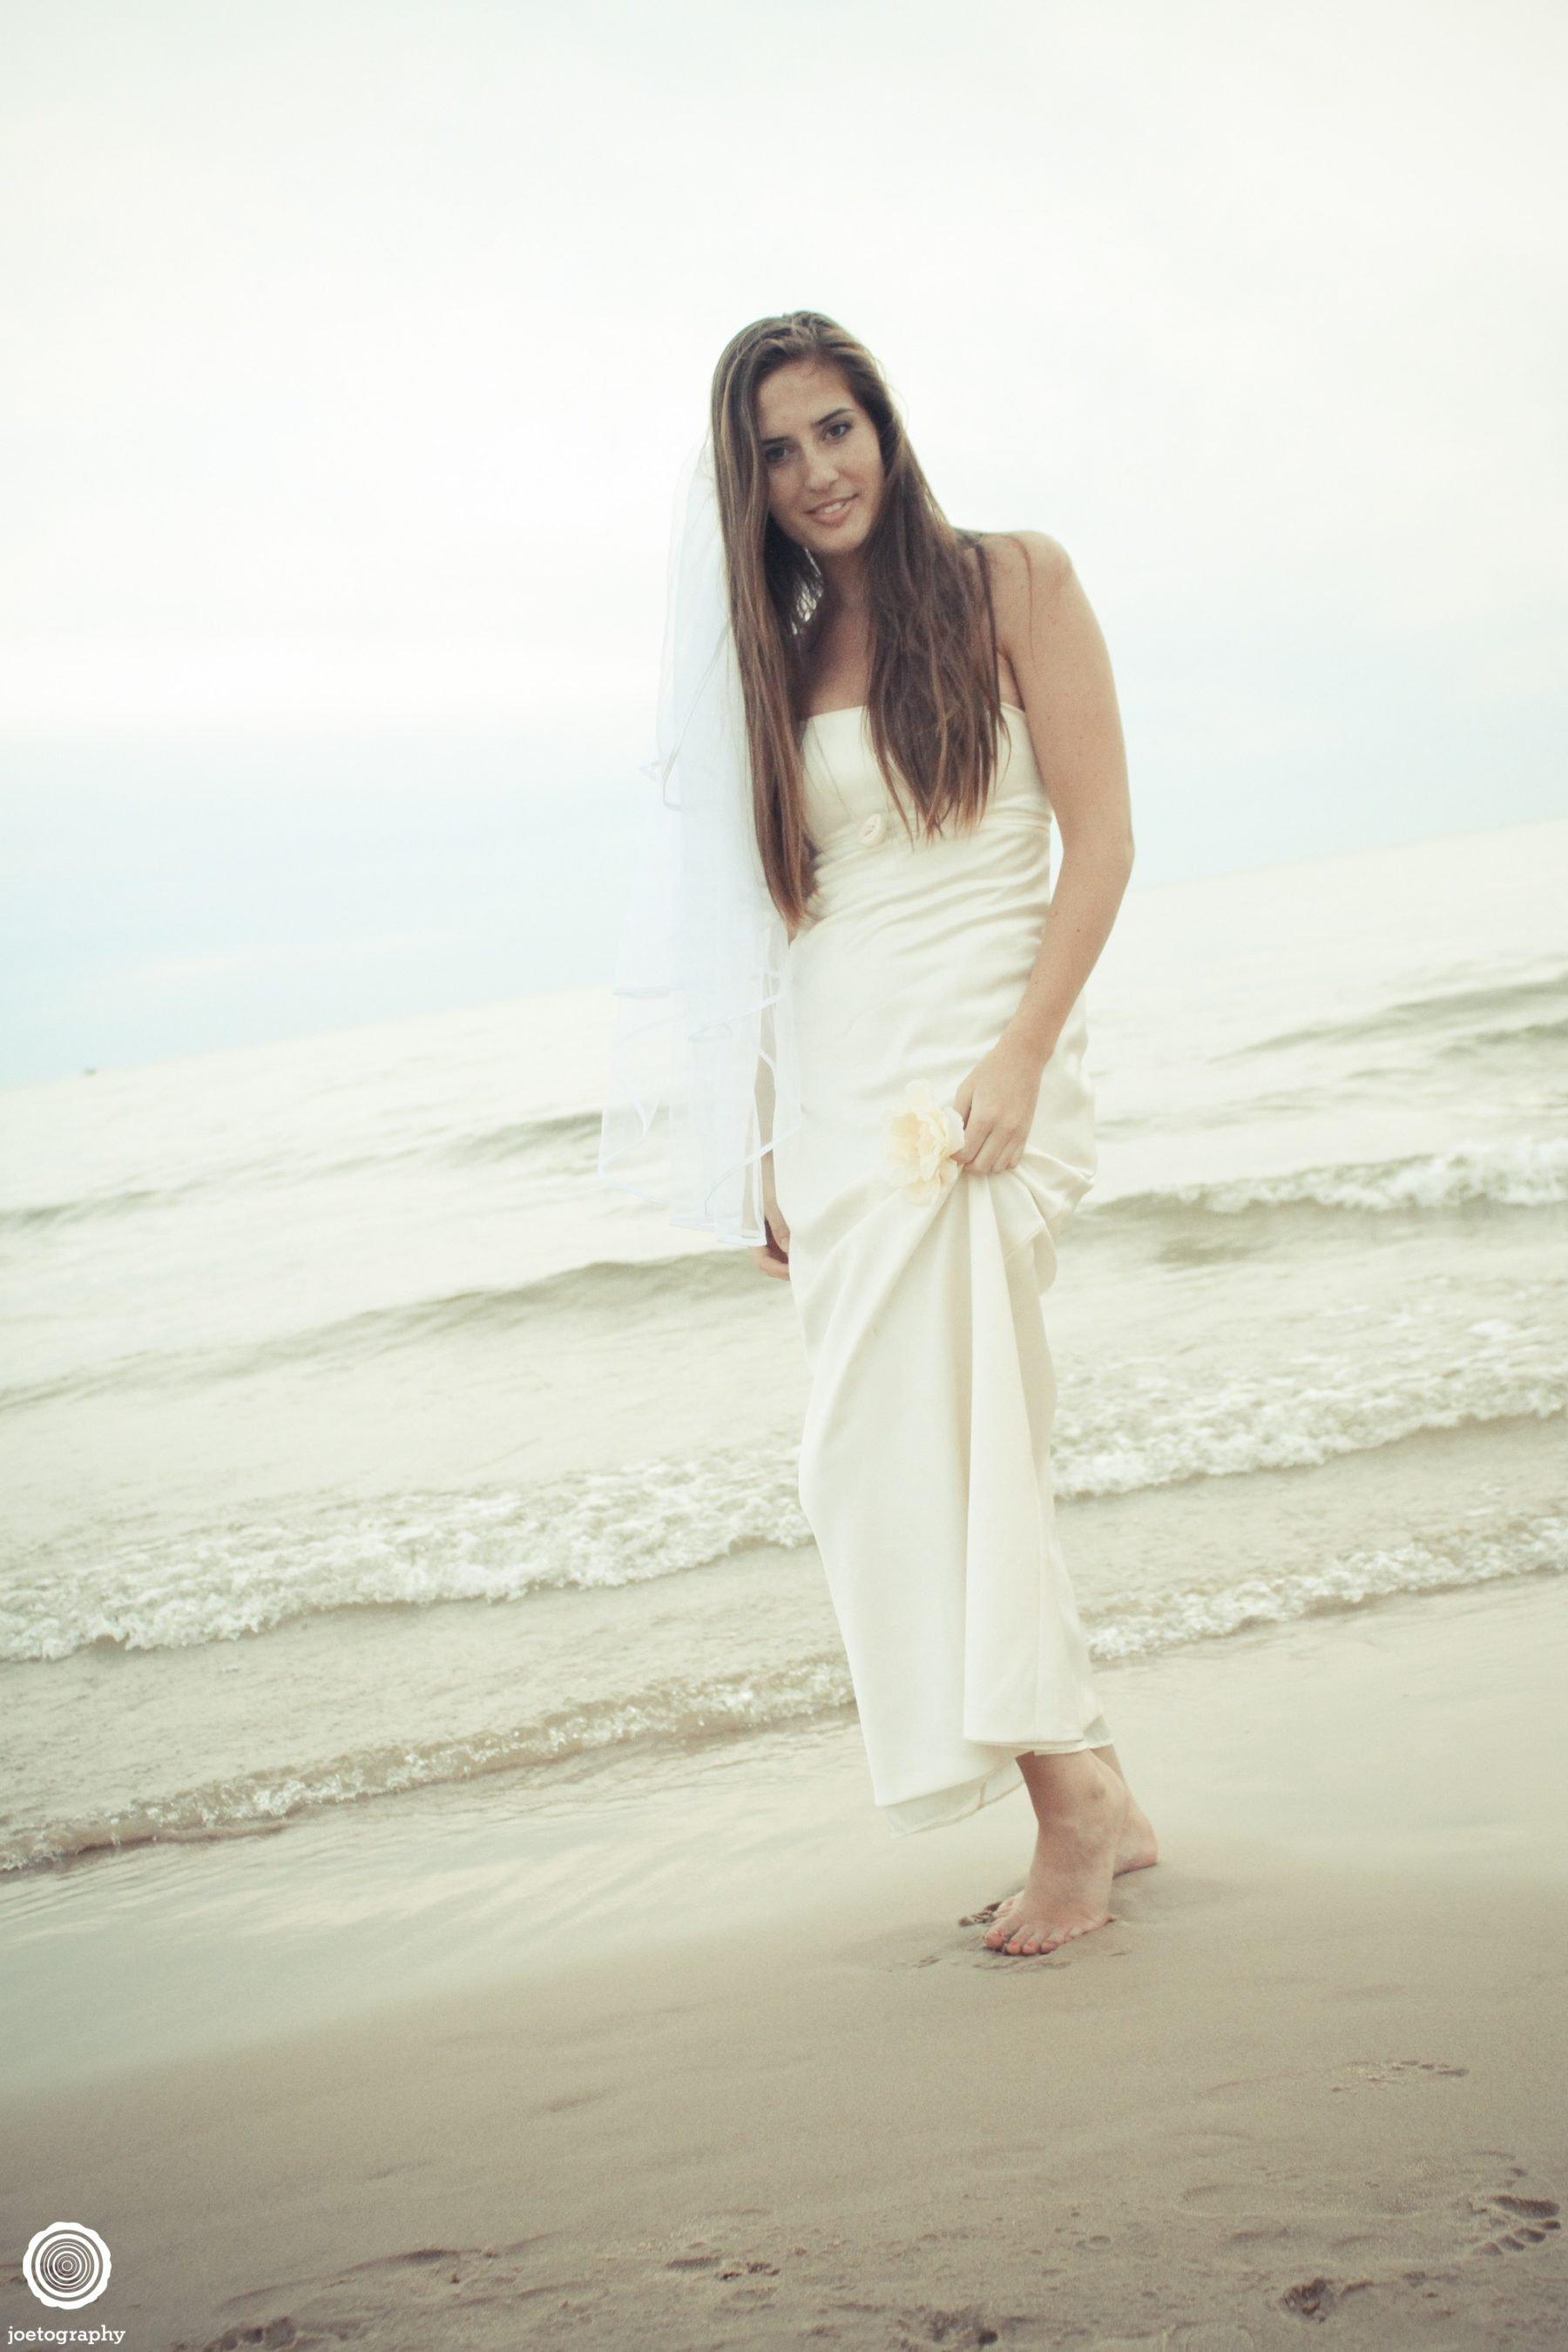 Trash-Wedding-Dress-Photos-Grand-Haven-Michigan-139